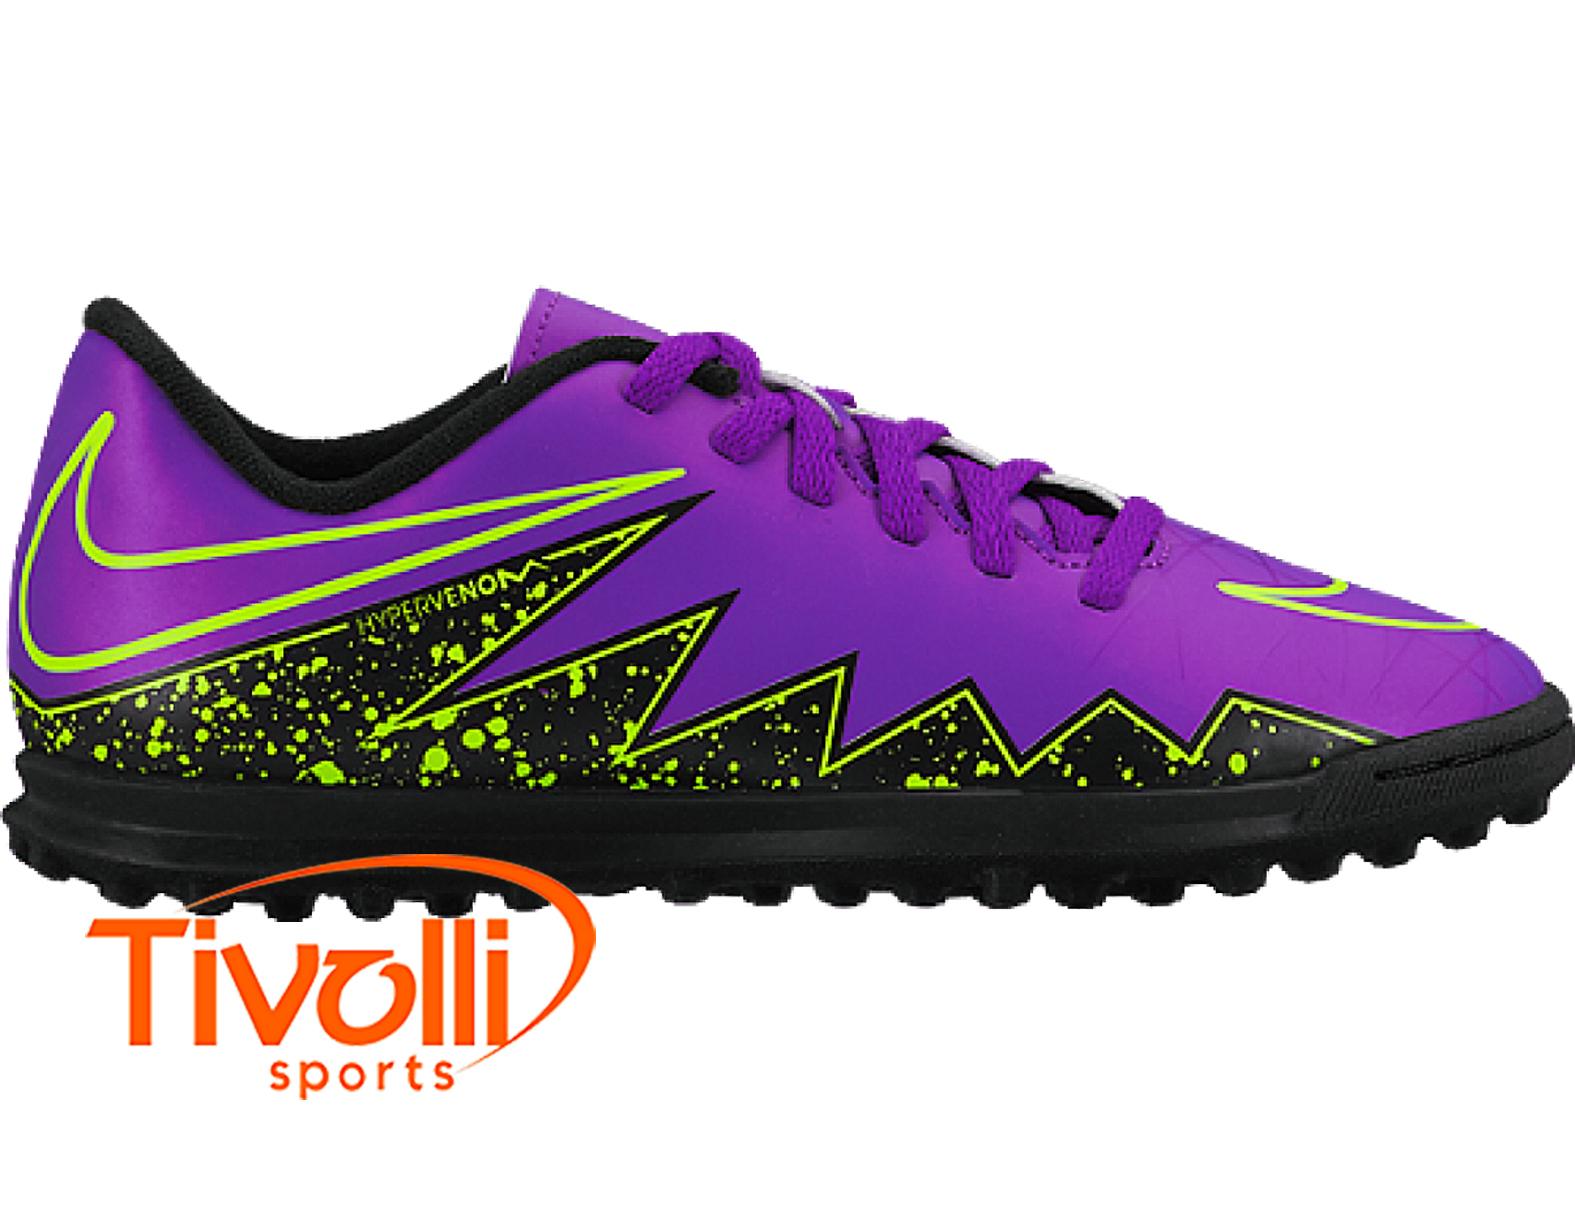 bf2aeb72449ad Chuteira Nike JR Hypervenom Phade II TF Society Infantil > >